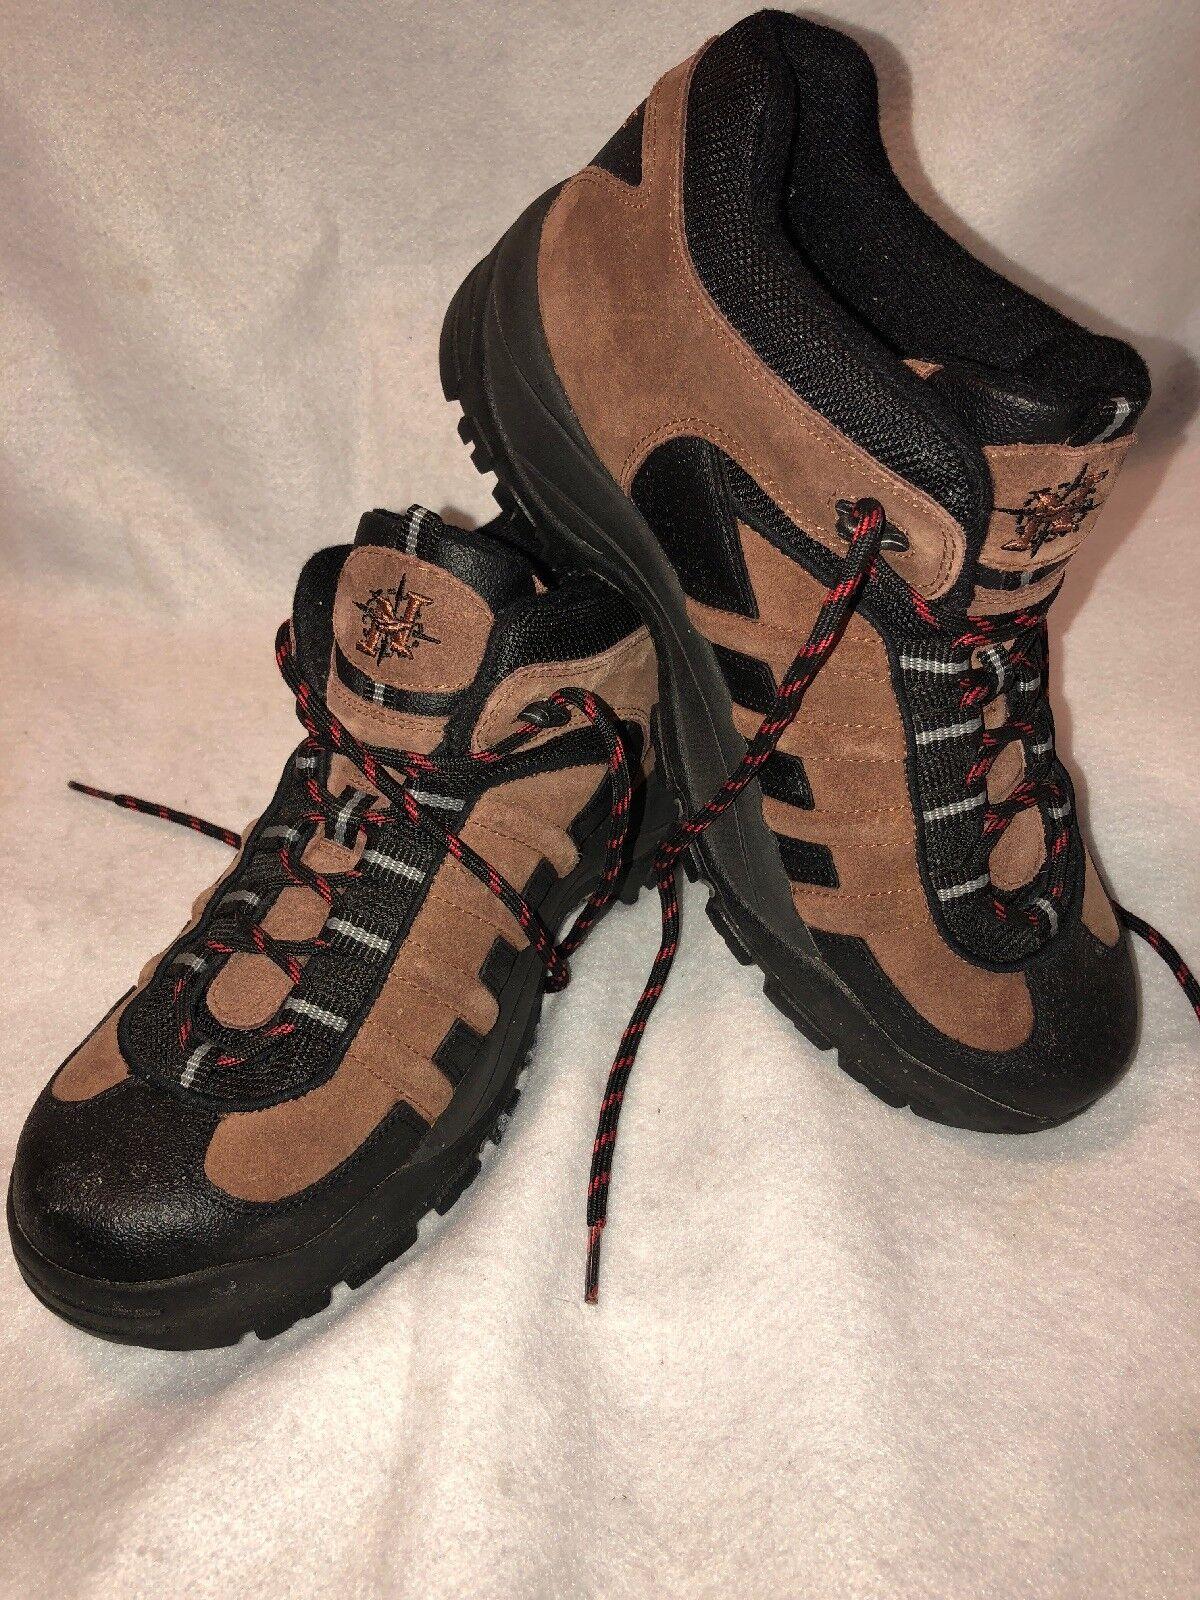 026430584f6 Nevados Men's Hiking BOOTS Low Hiking Shoe Vulcan Brown Black Size 8